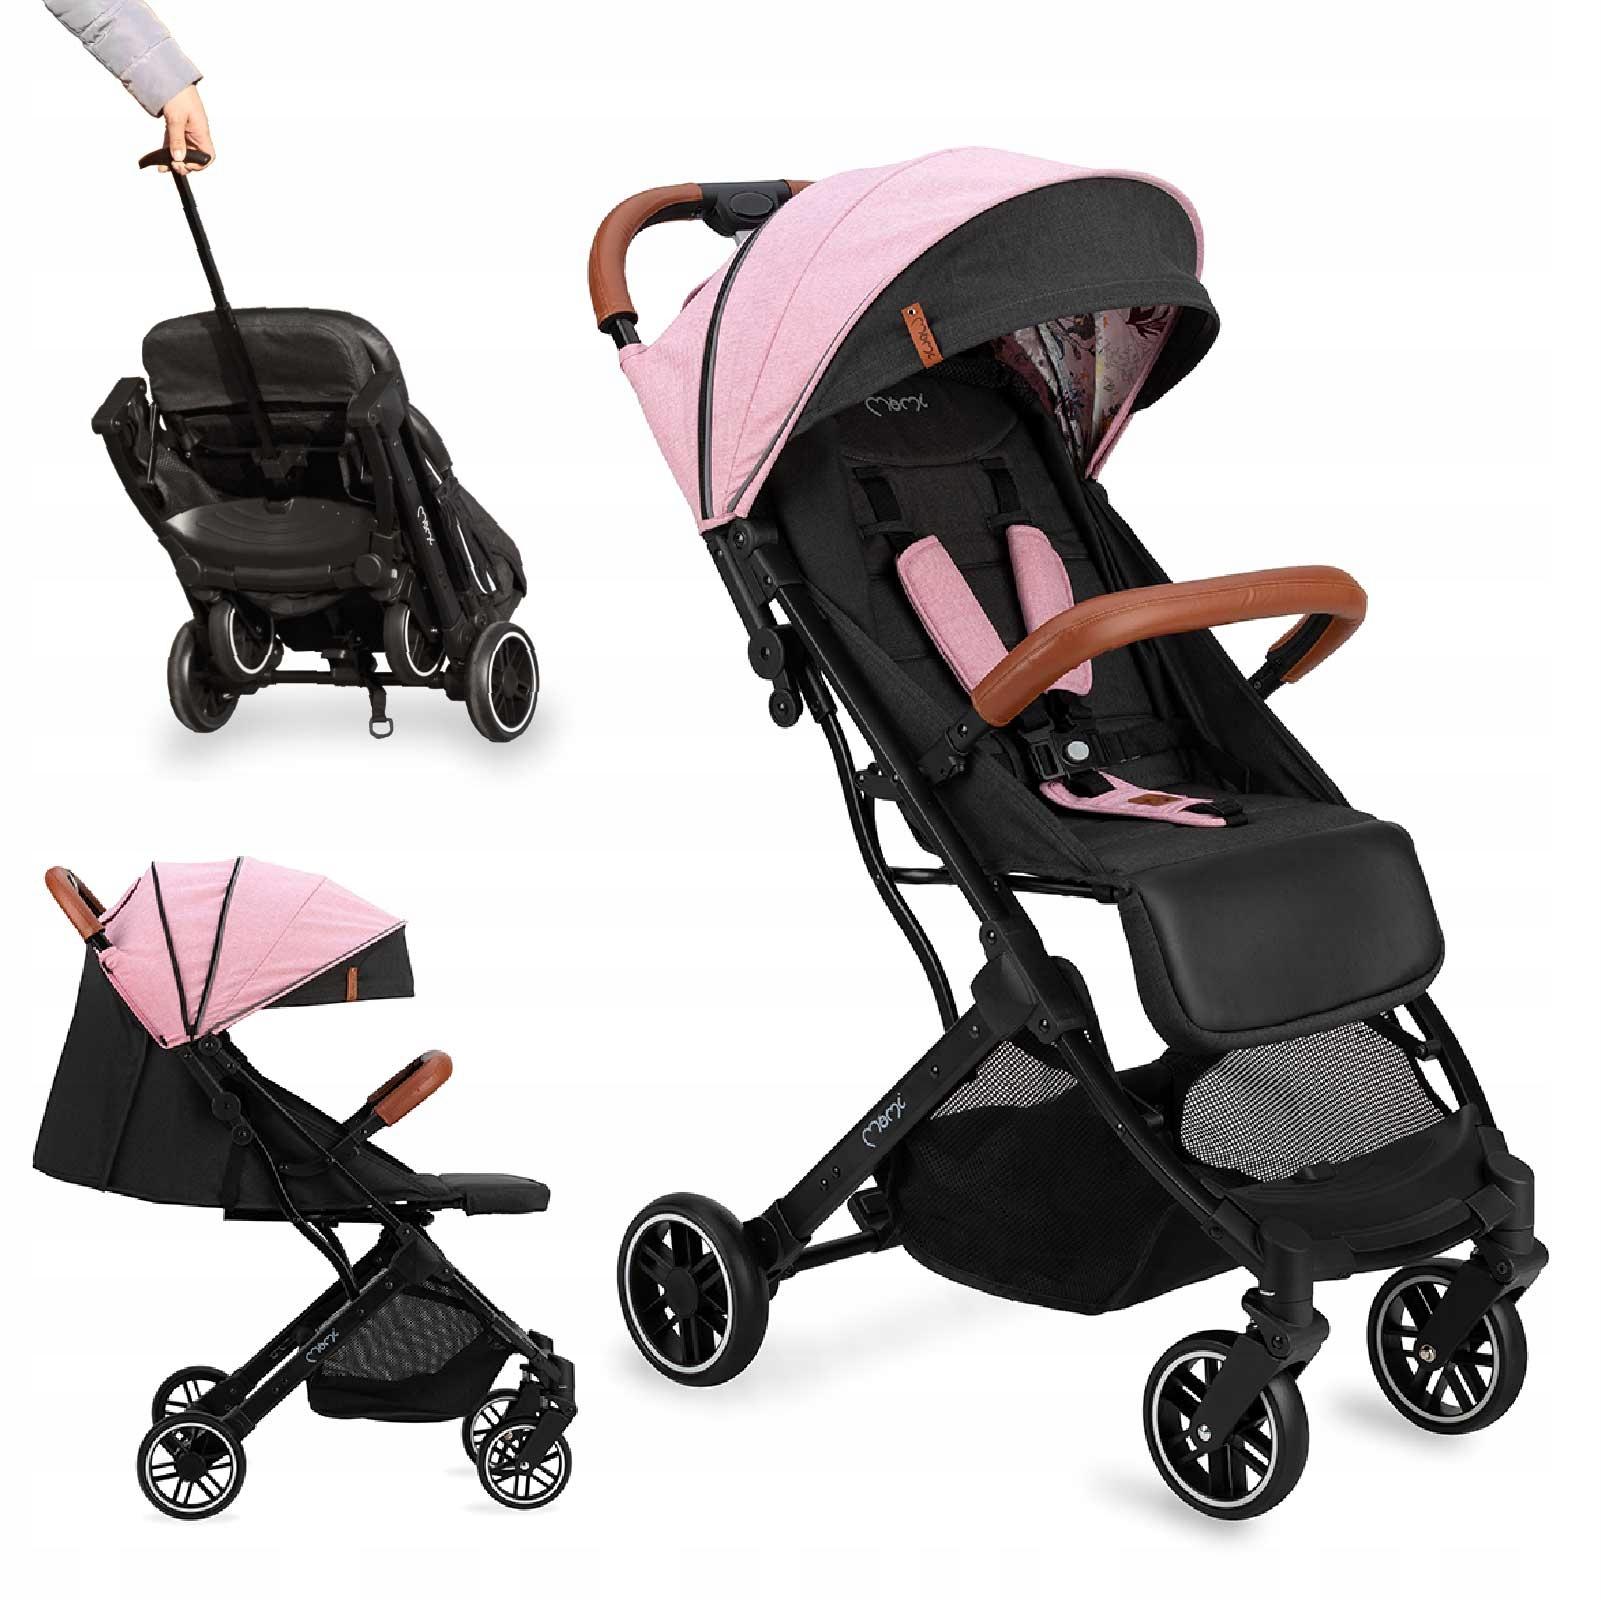 MoMi ESTELLE wózek spacerowy różowy